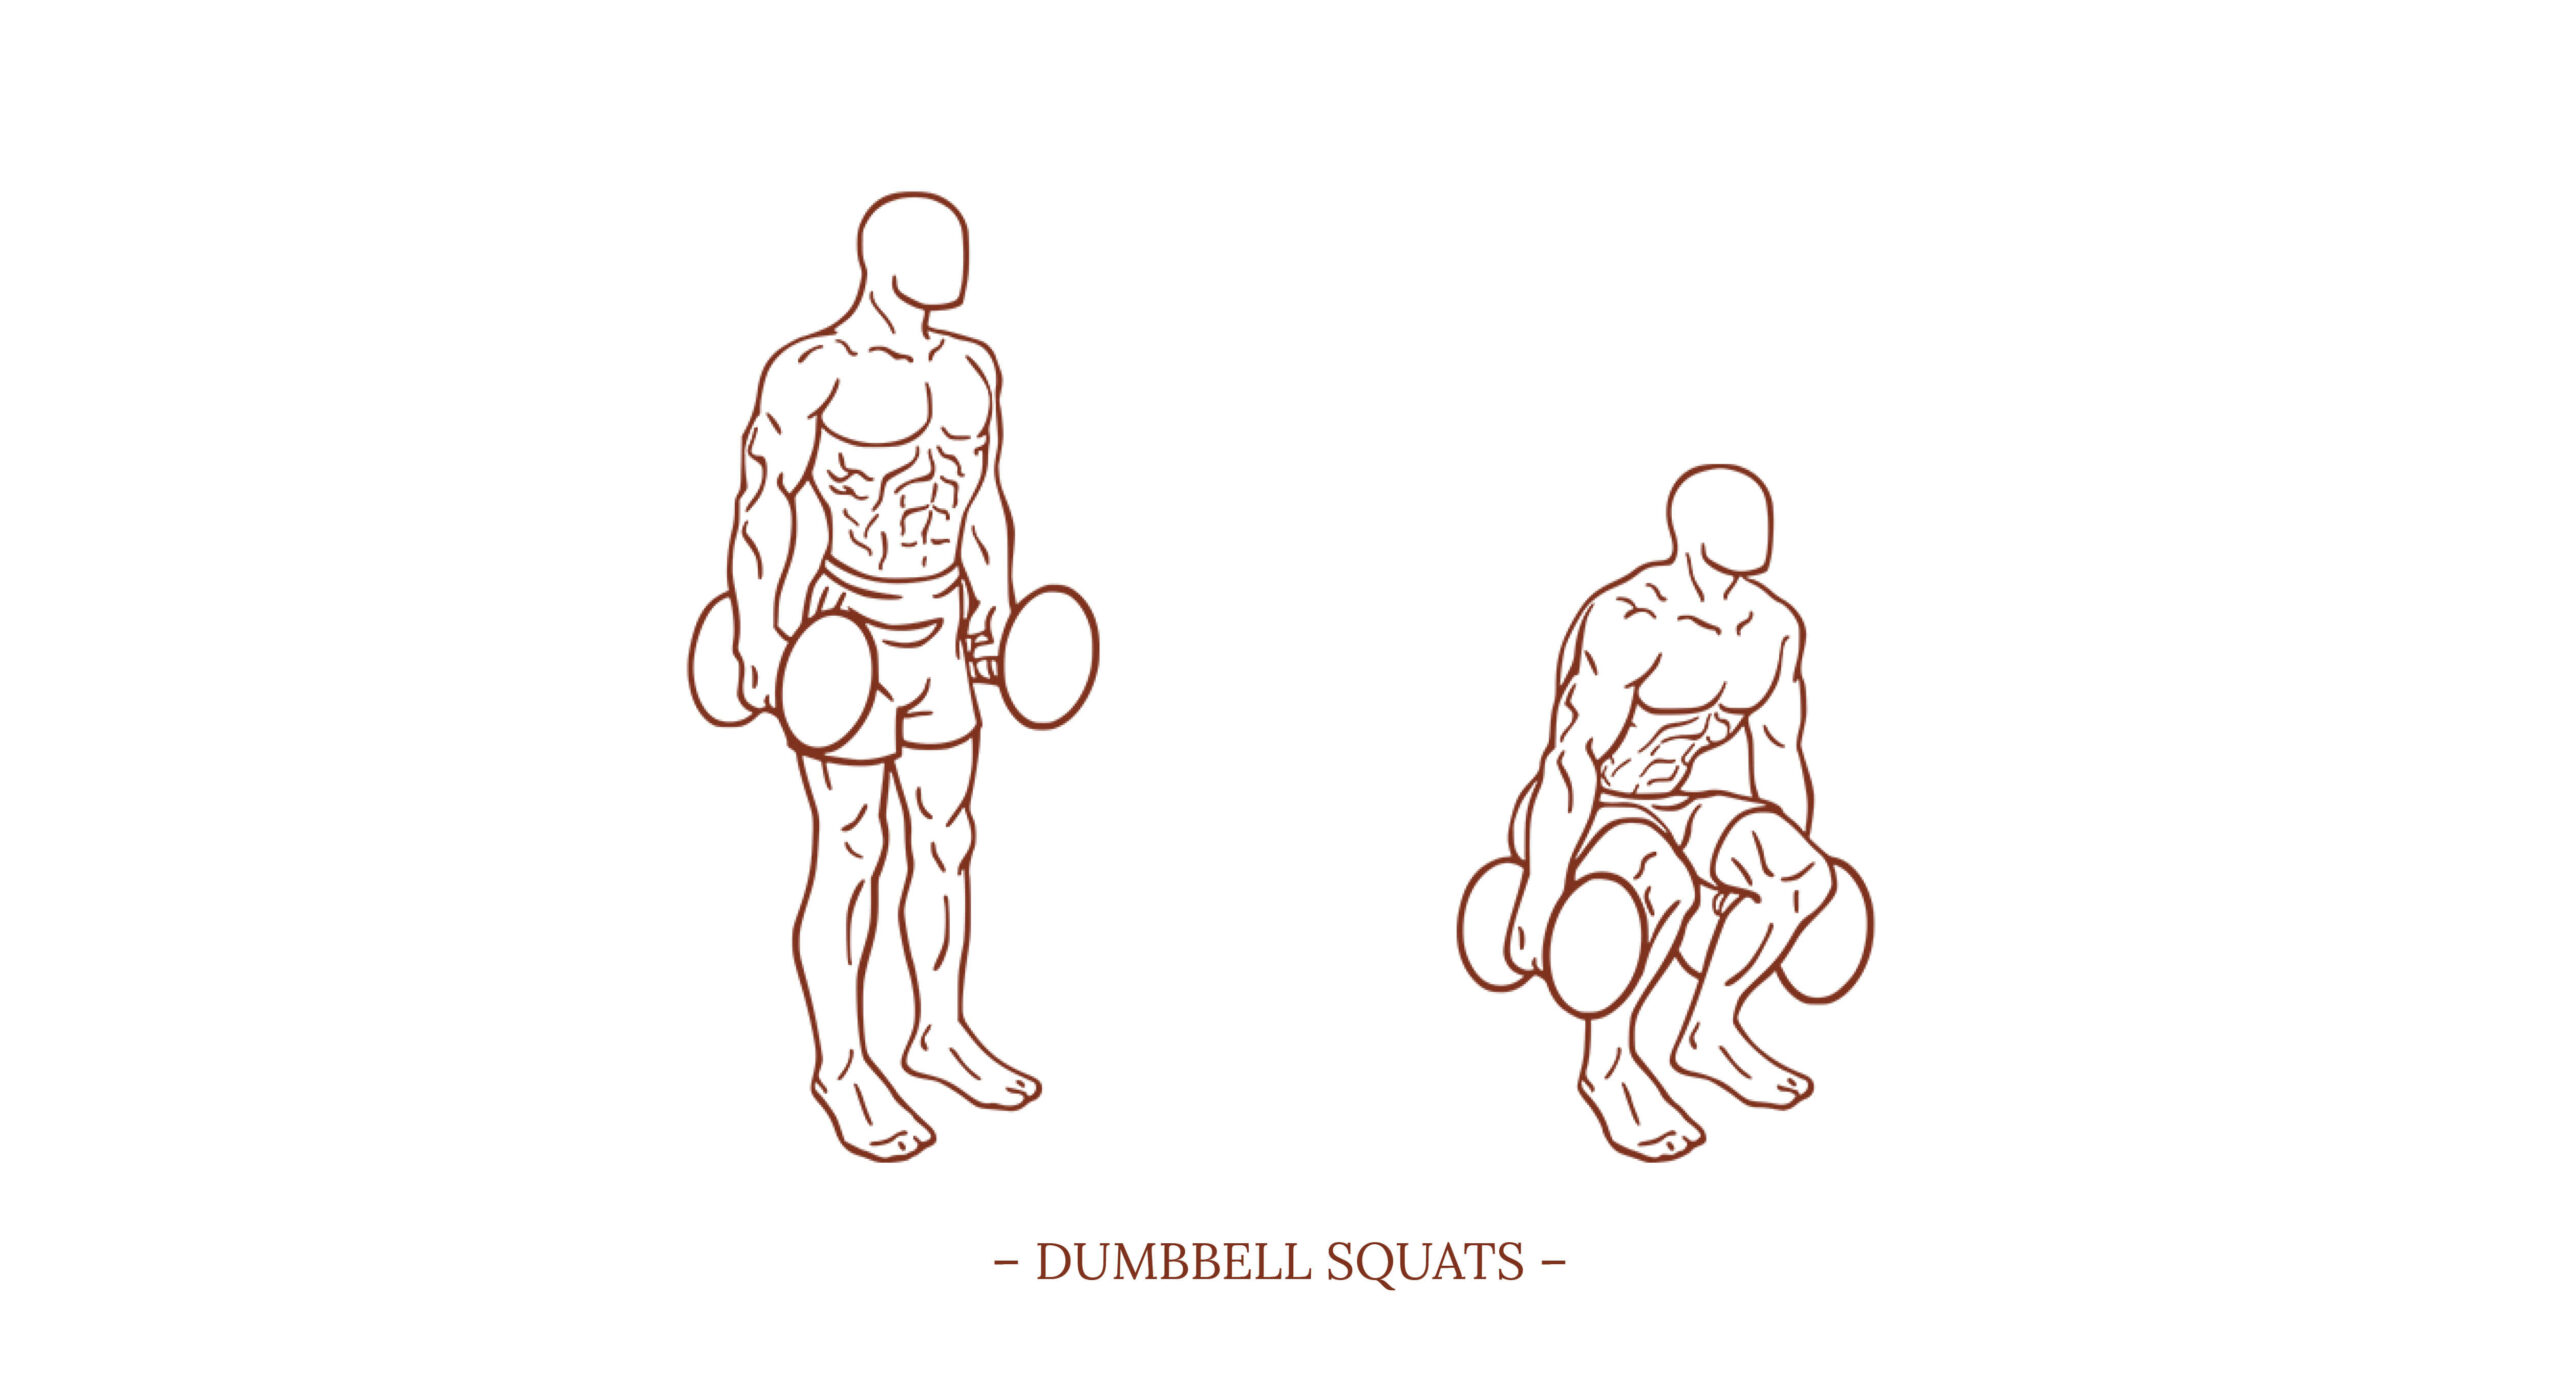 Dumbbell Squats Illustration